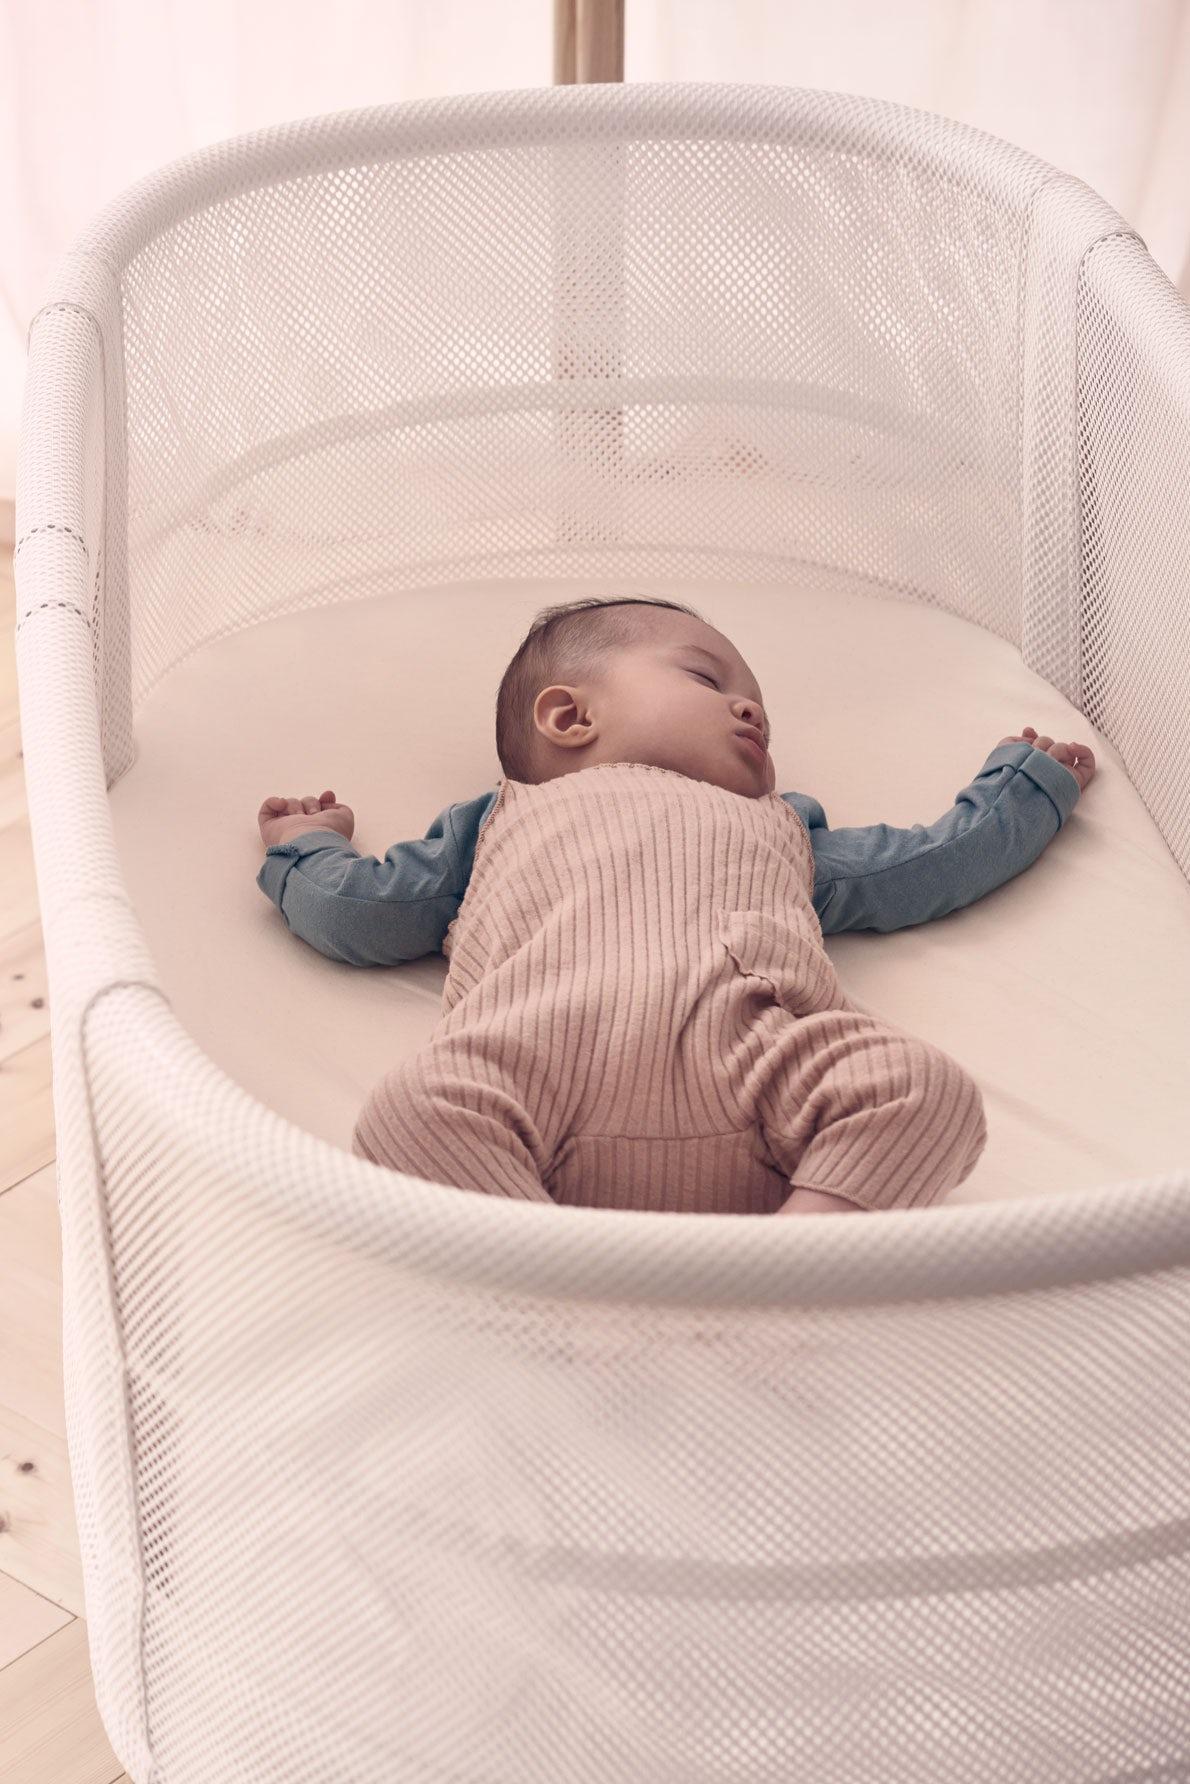 Baby Crib in safe, airy design | BABYBJÖRN